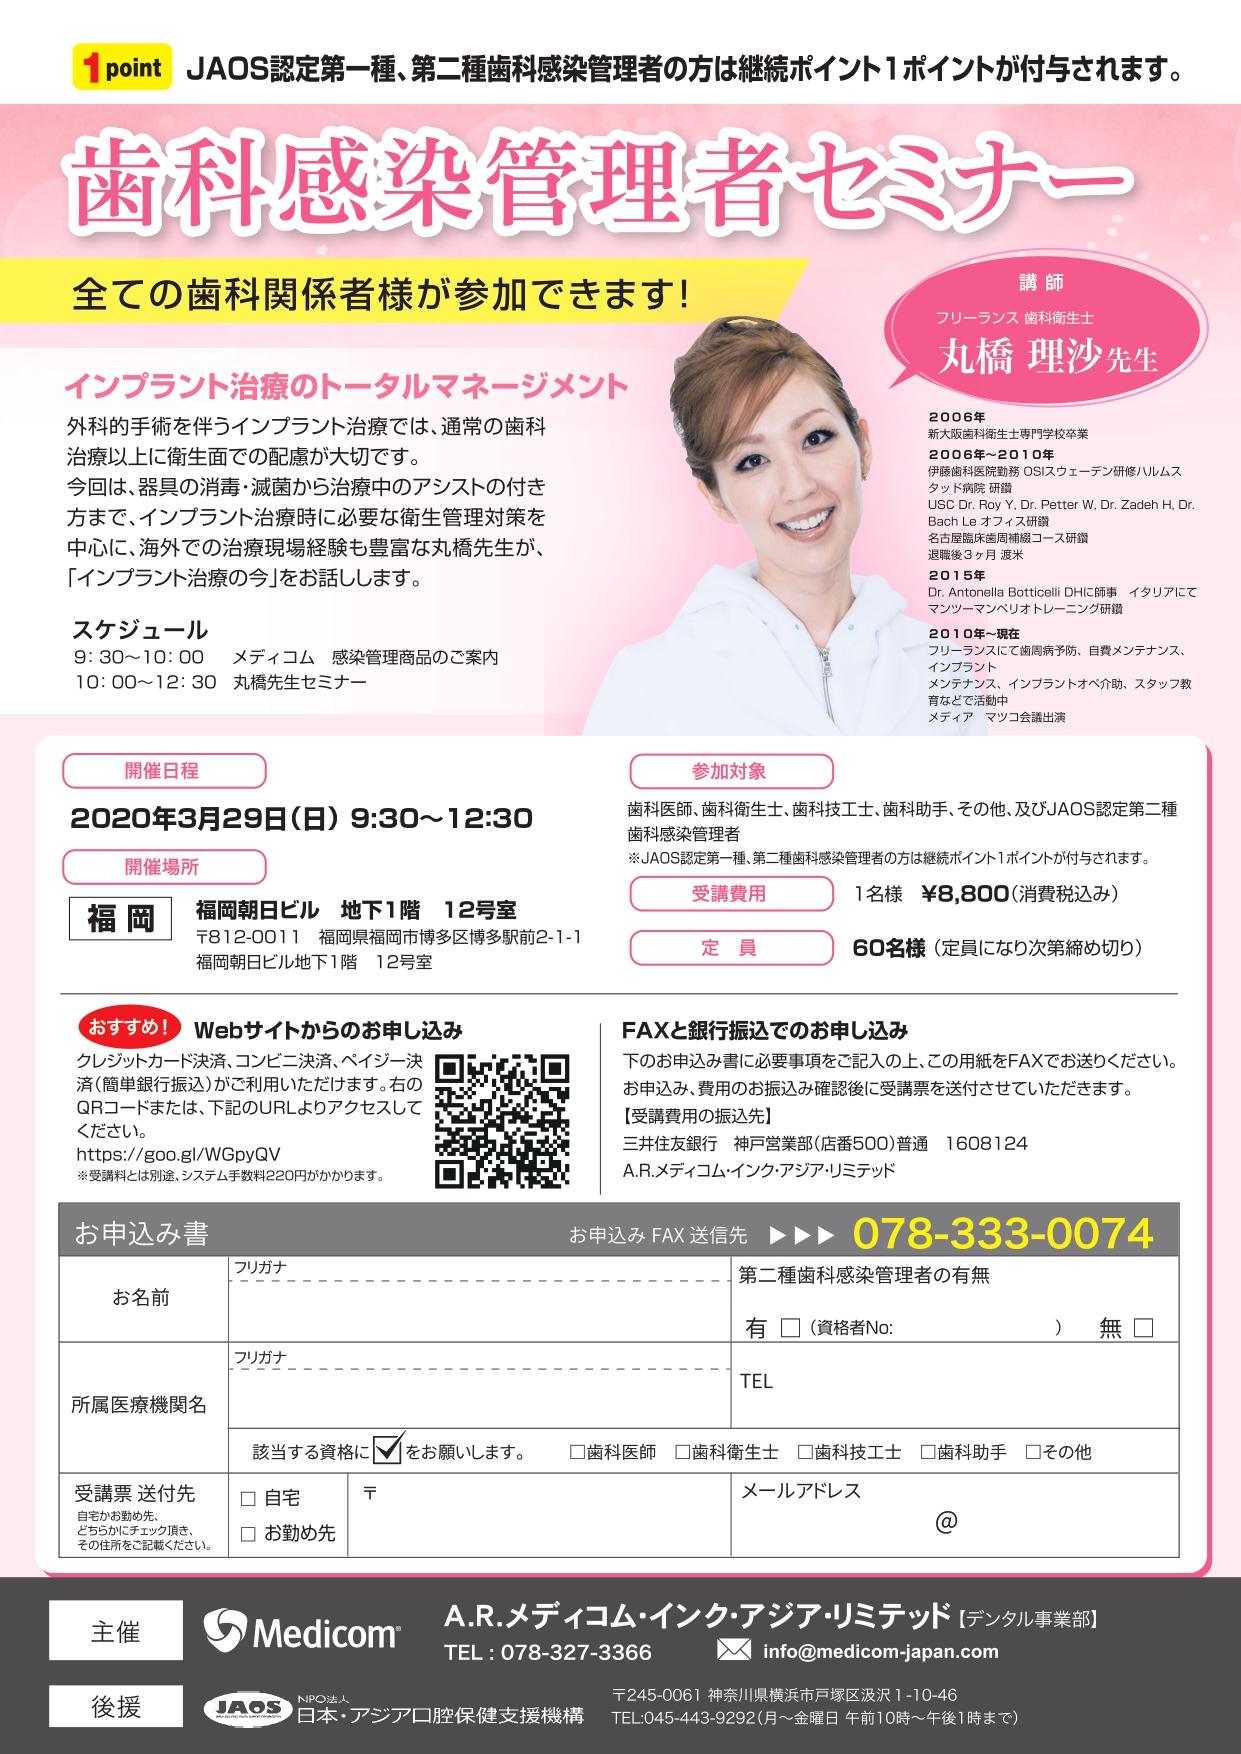 【福岡】歯科感染管理者セミナー